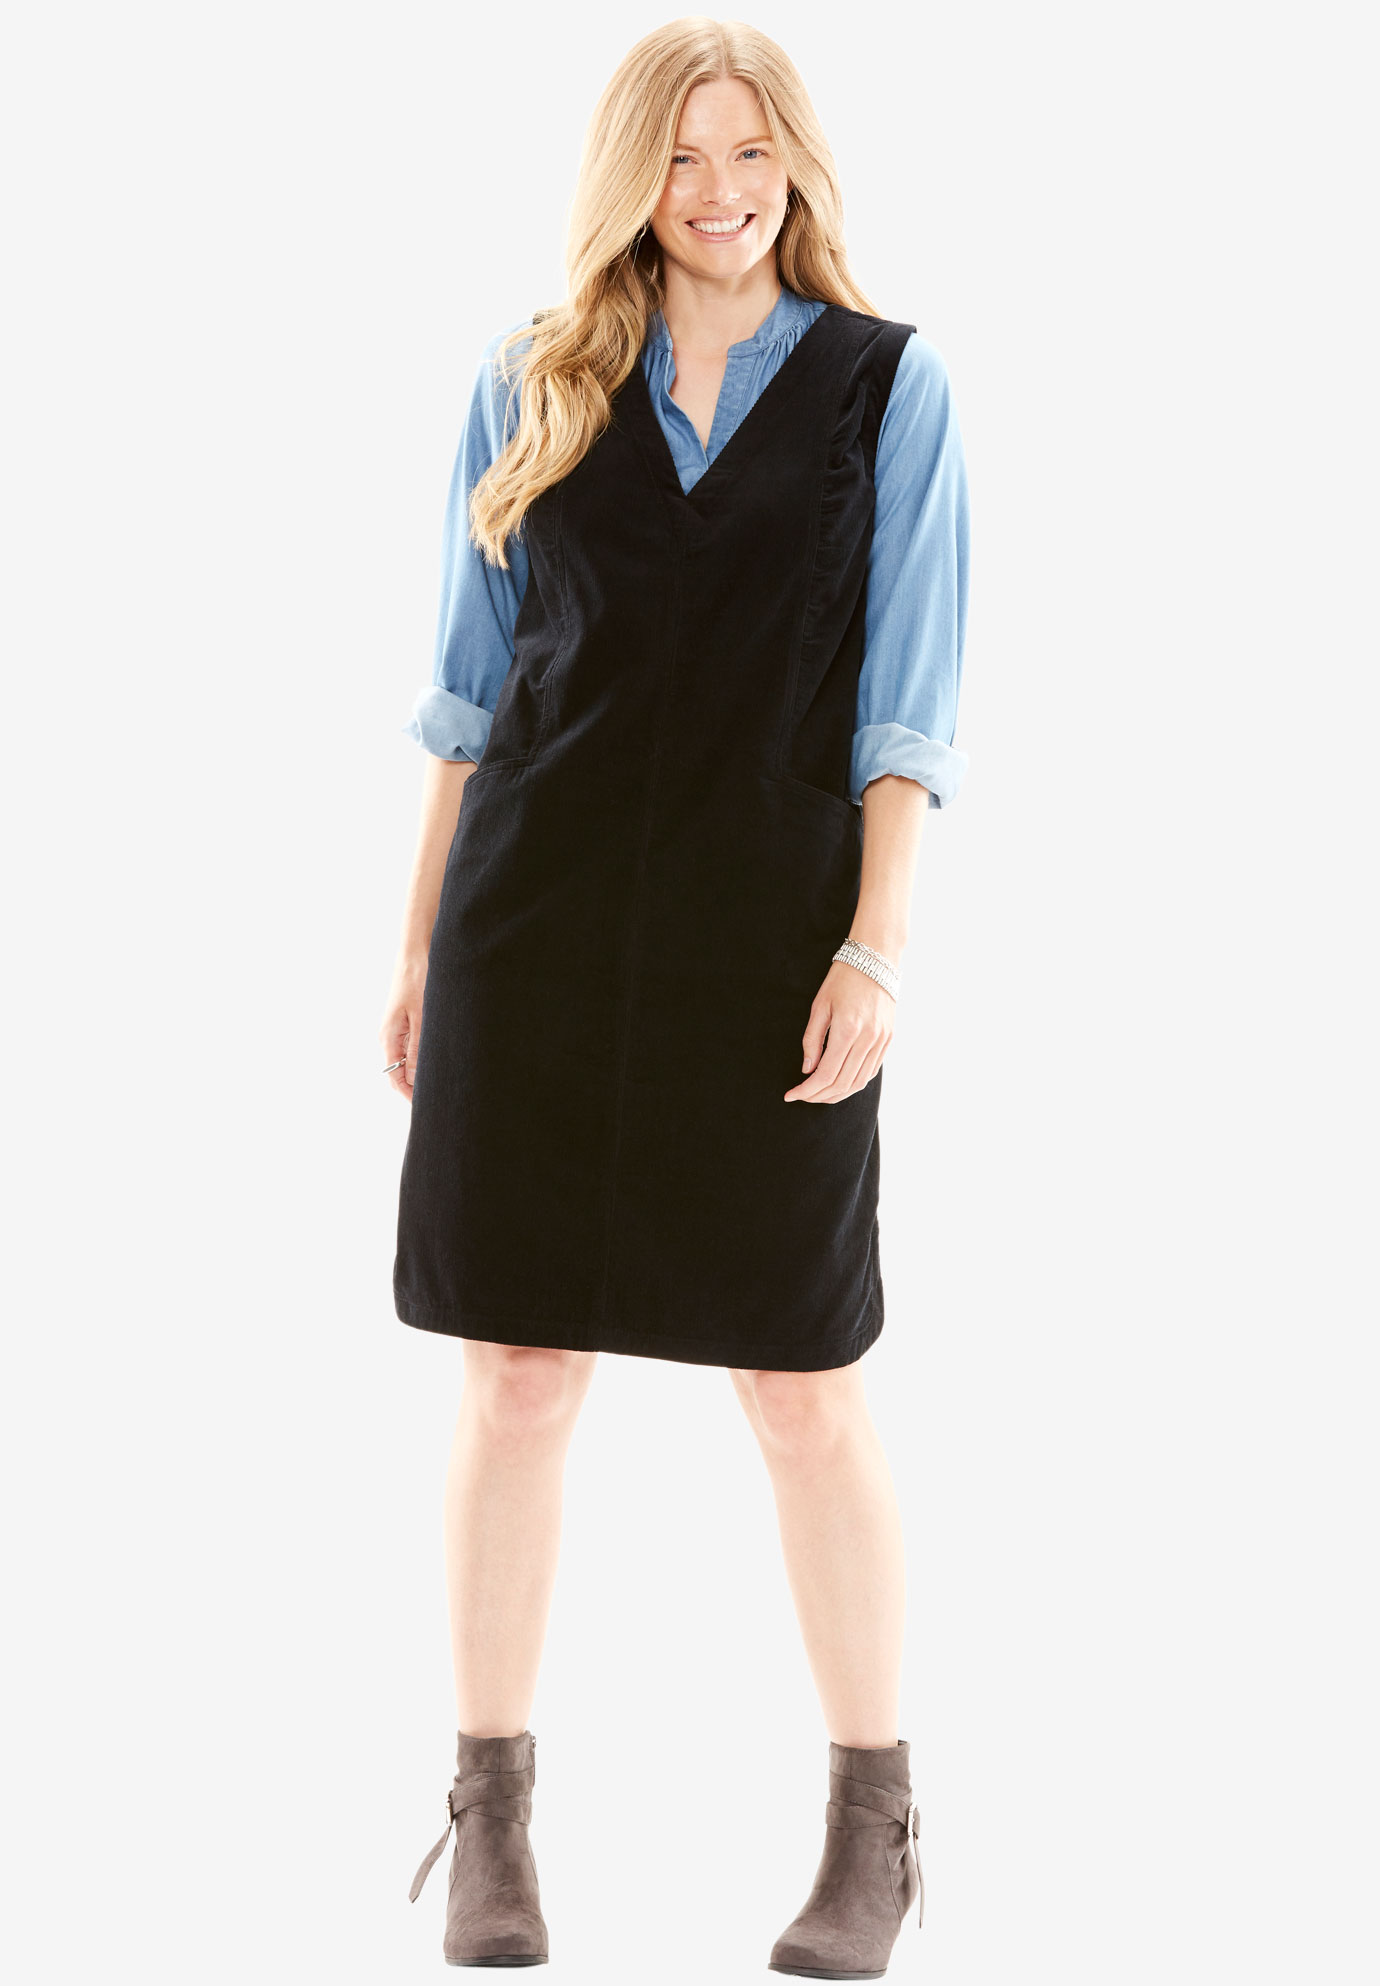 Corduroy Jumper Plus Size Casual Dresses Full Beauty